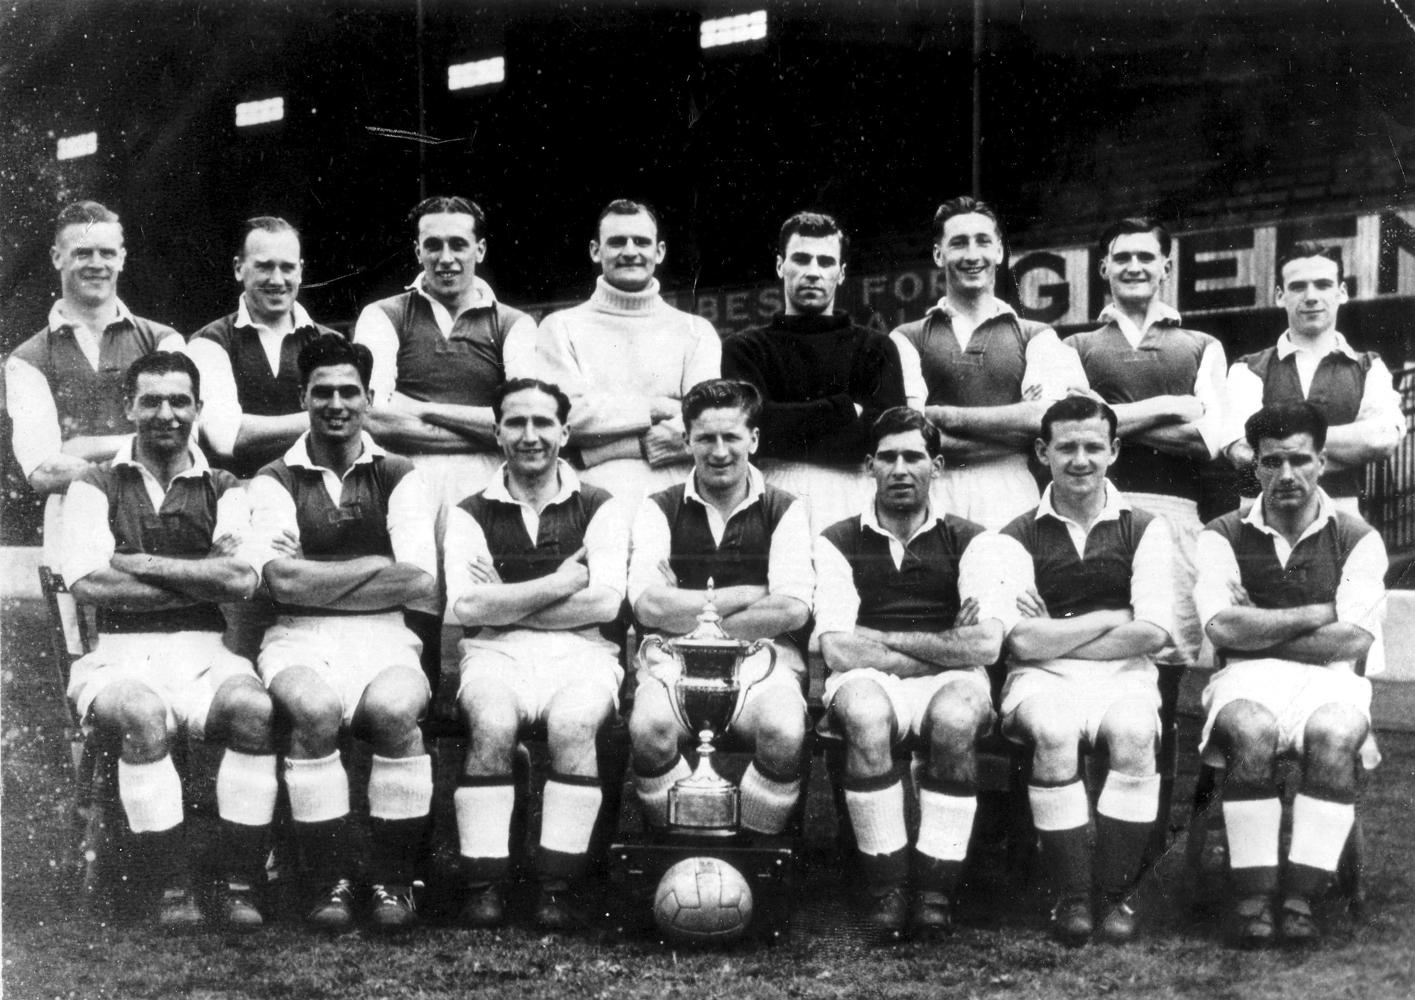 HIbernian Football Club Team 1950s